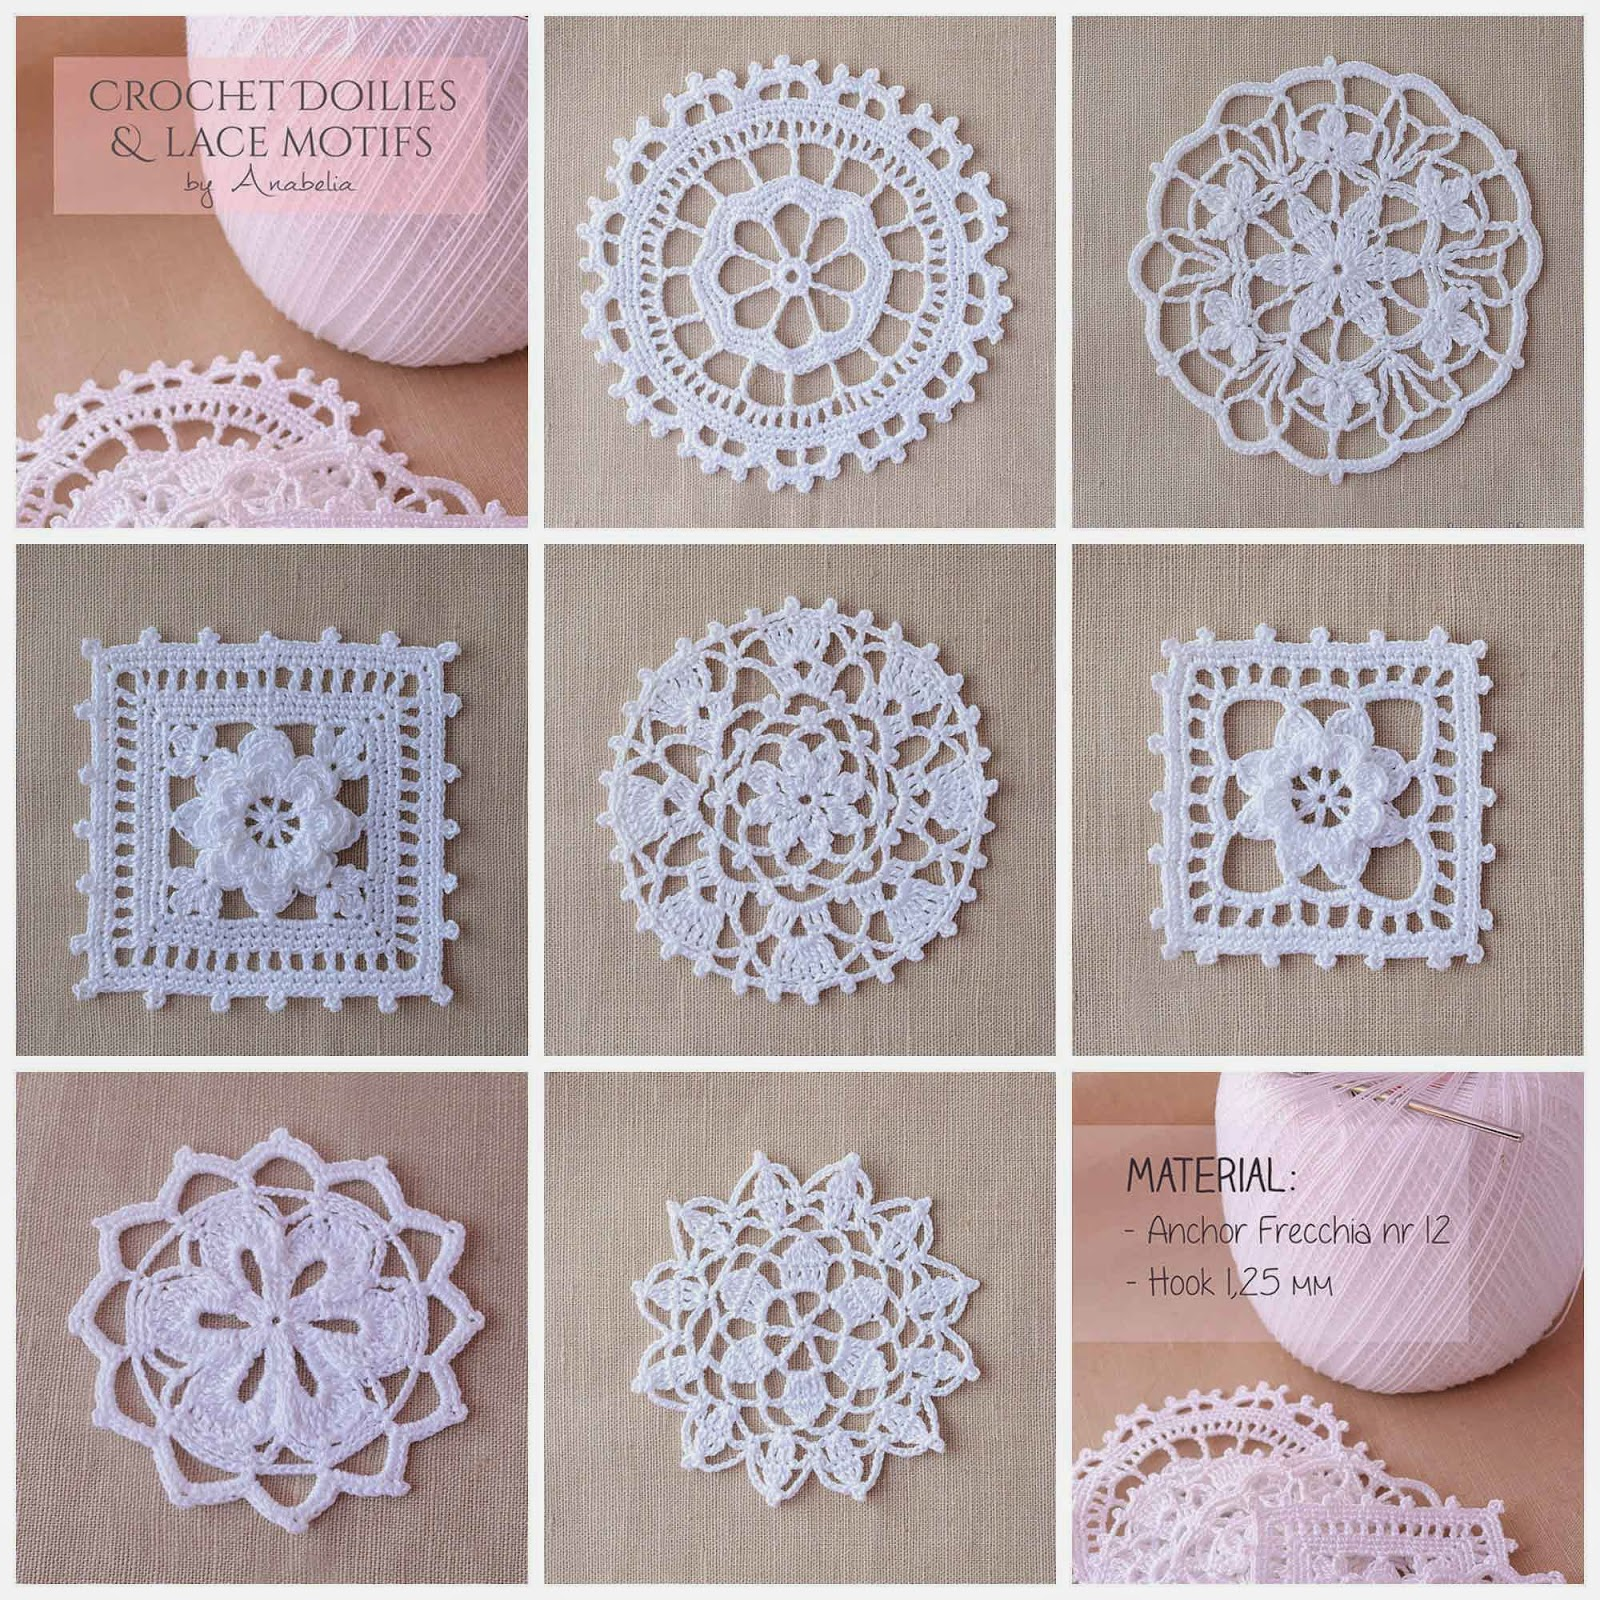 crochet square motif diagram pattern 2001 chevy malibu ls radio wiring anabelia craft design doilies and lace motifs